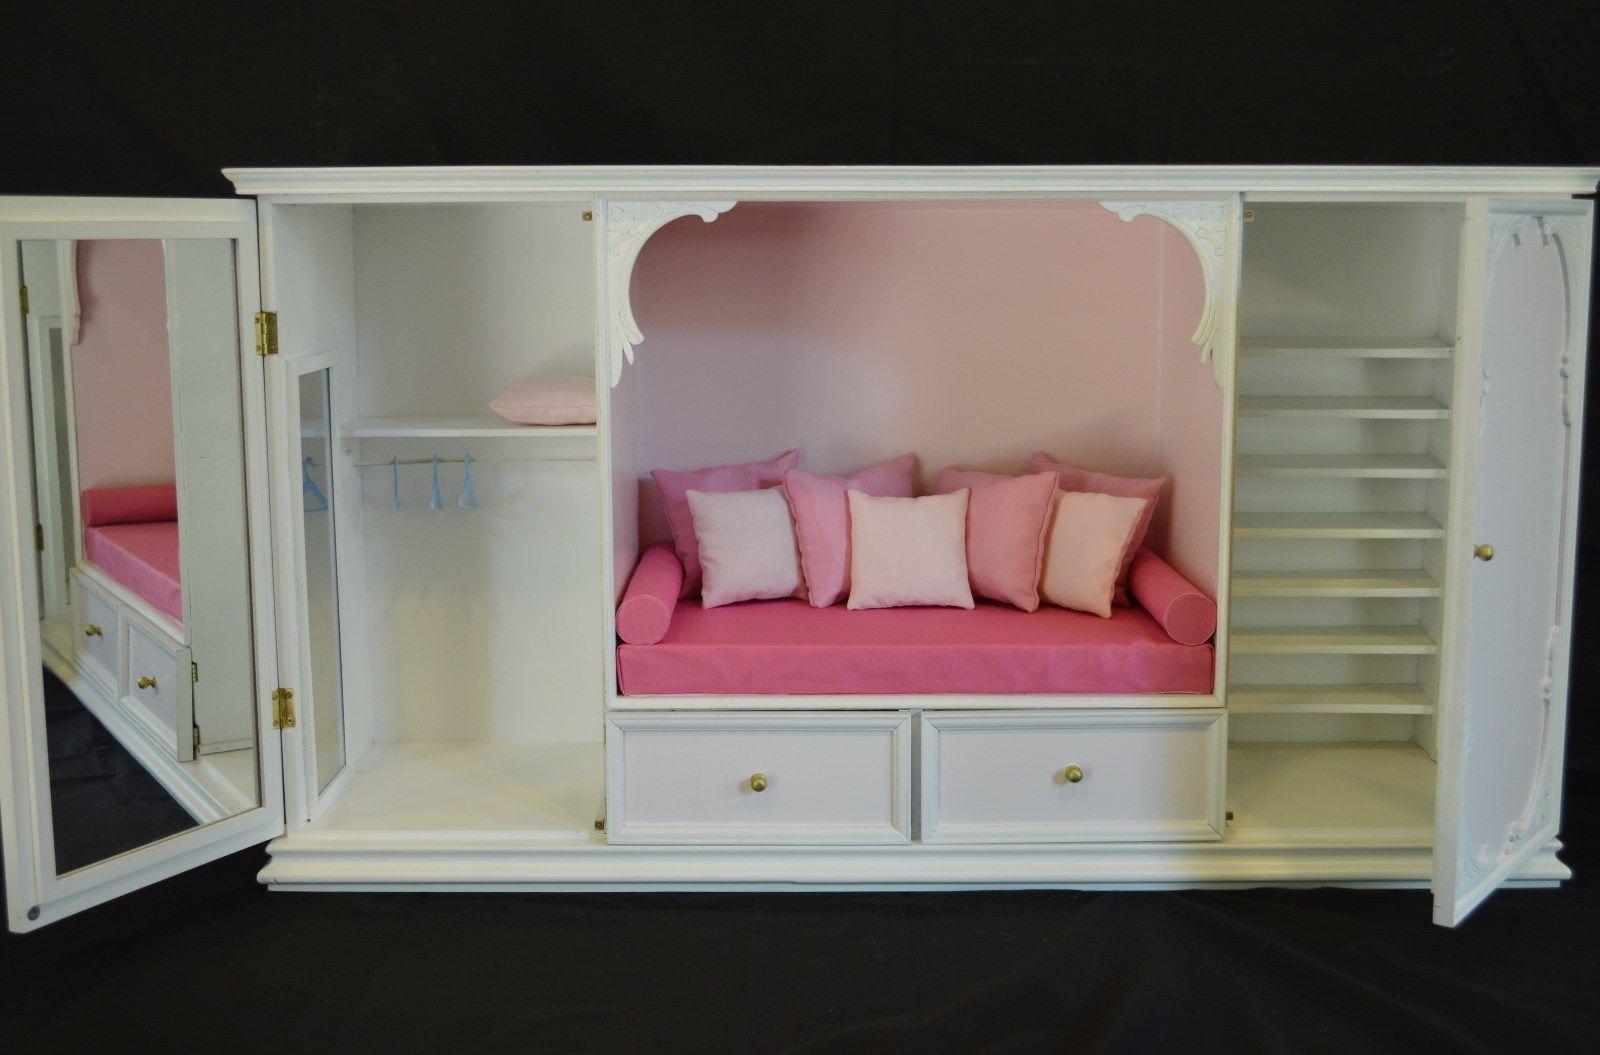 1 6 Scale Room Box or Diorama Regent Miniatures 23060 Nook Bed   eBay